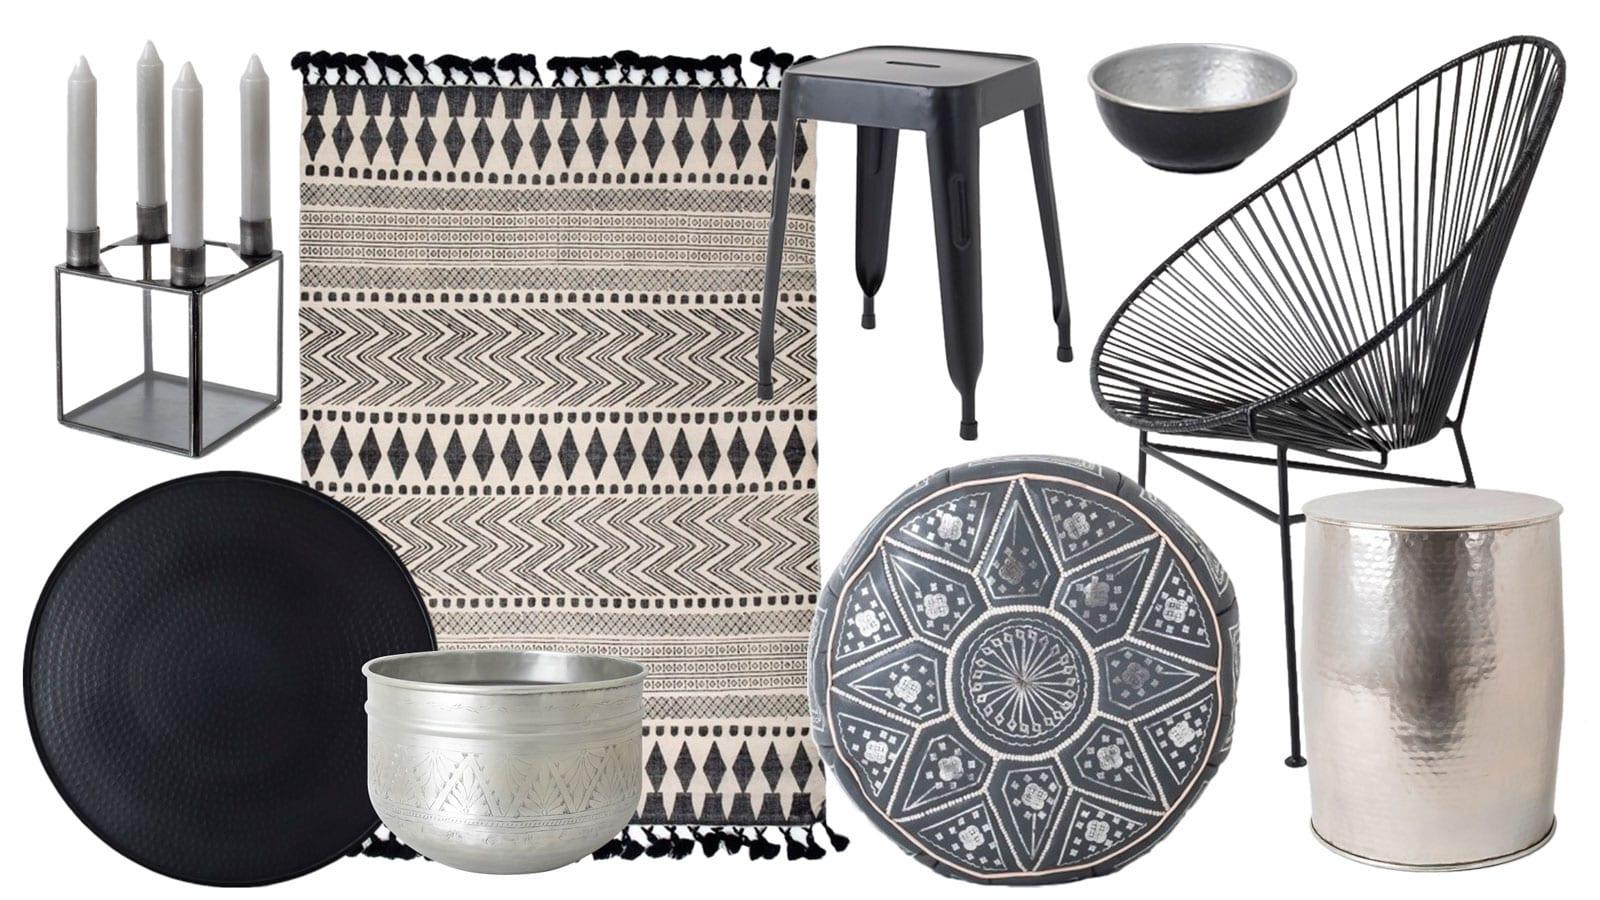 india may home favourites style minimalism